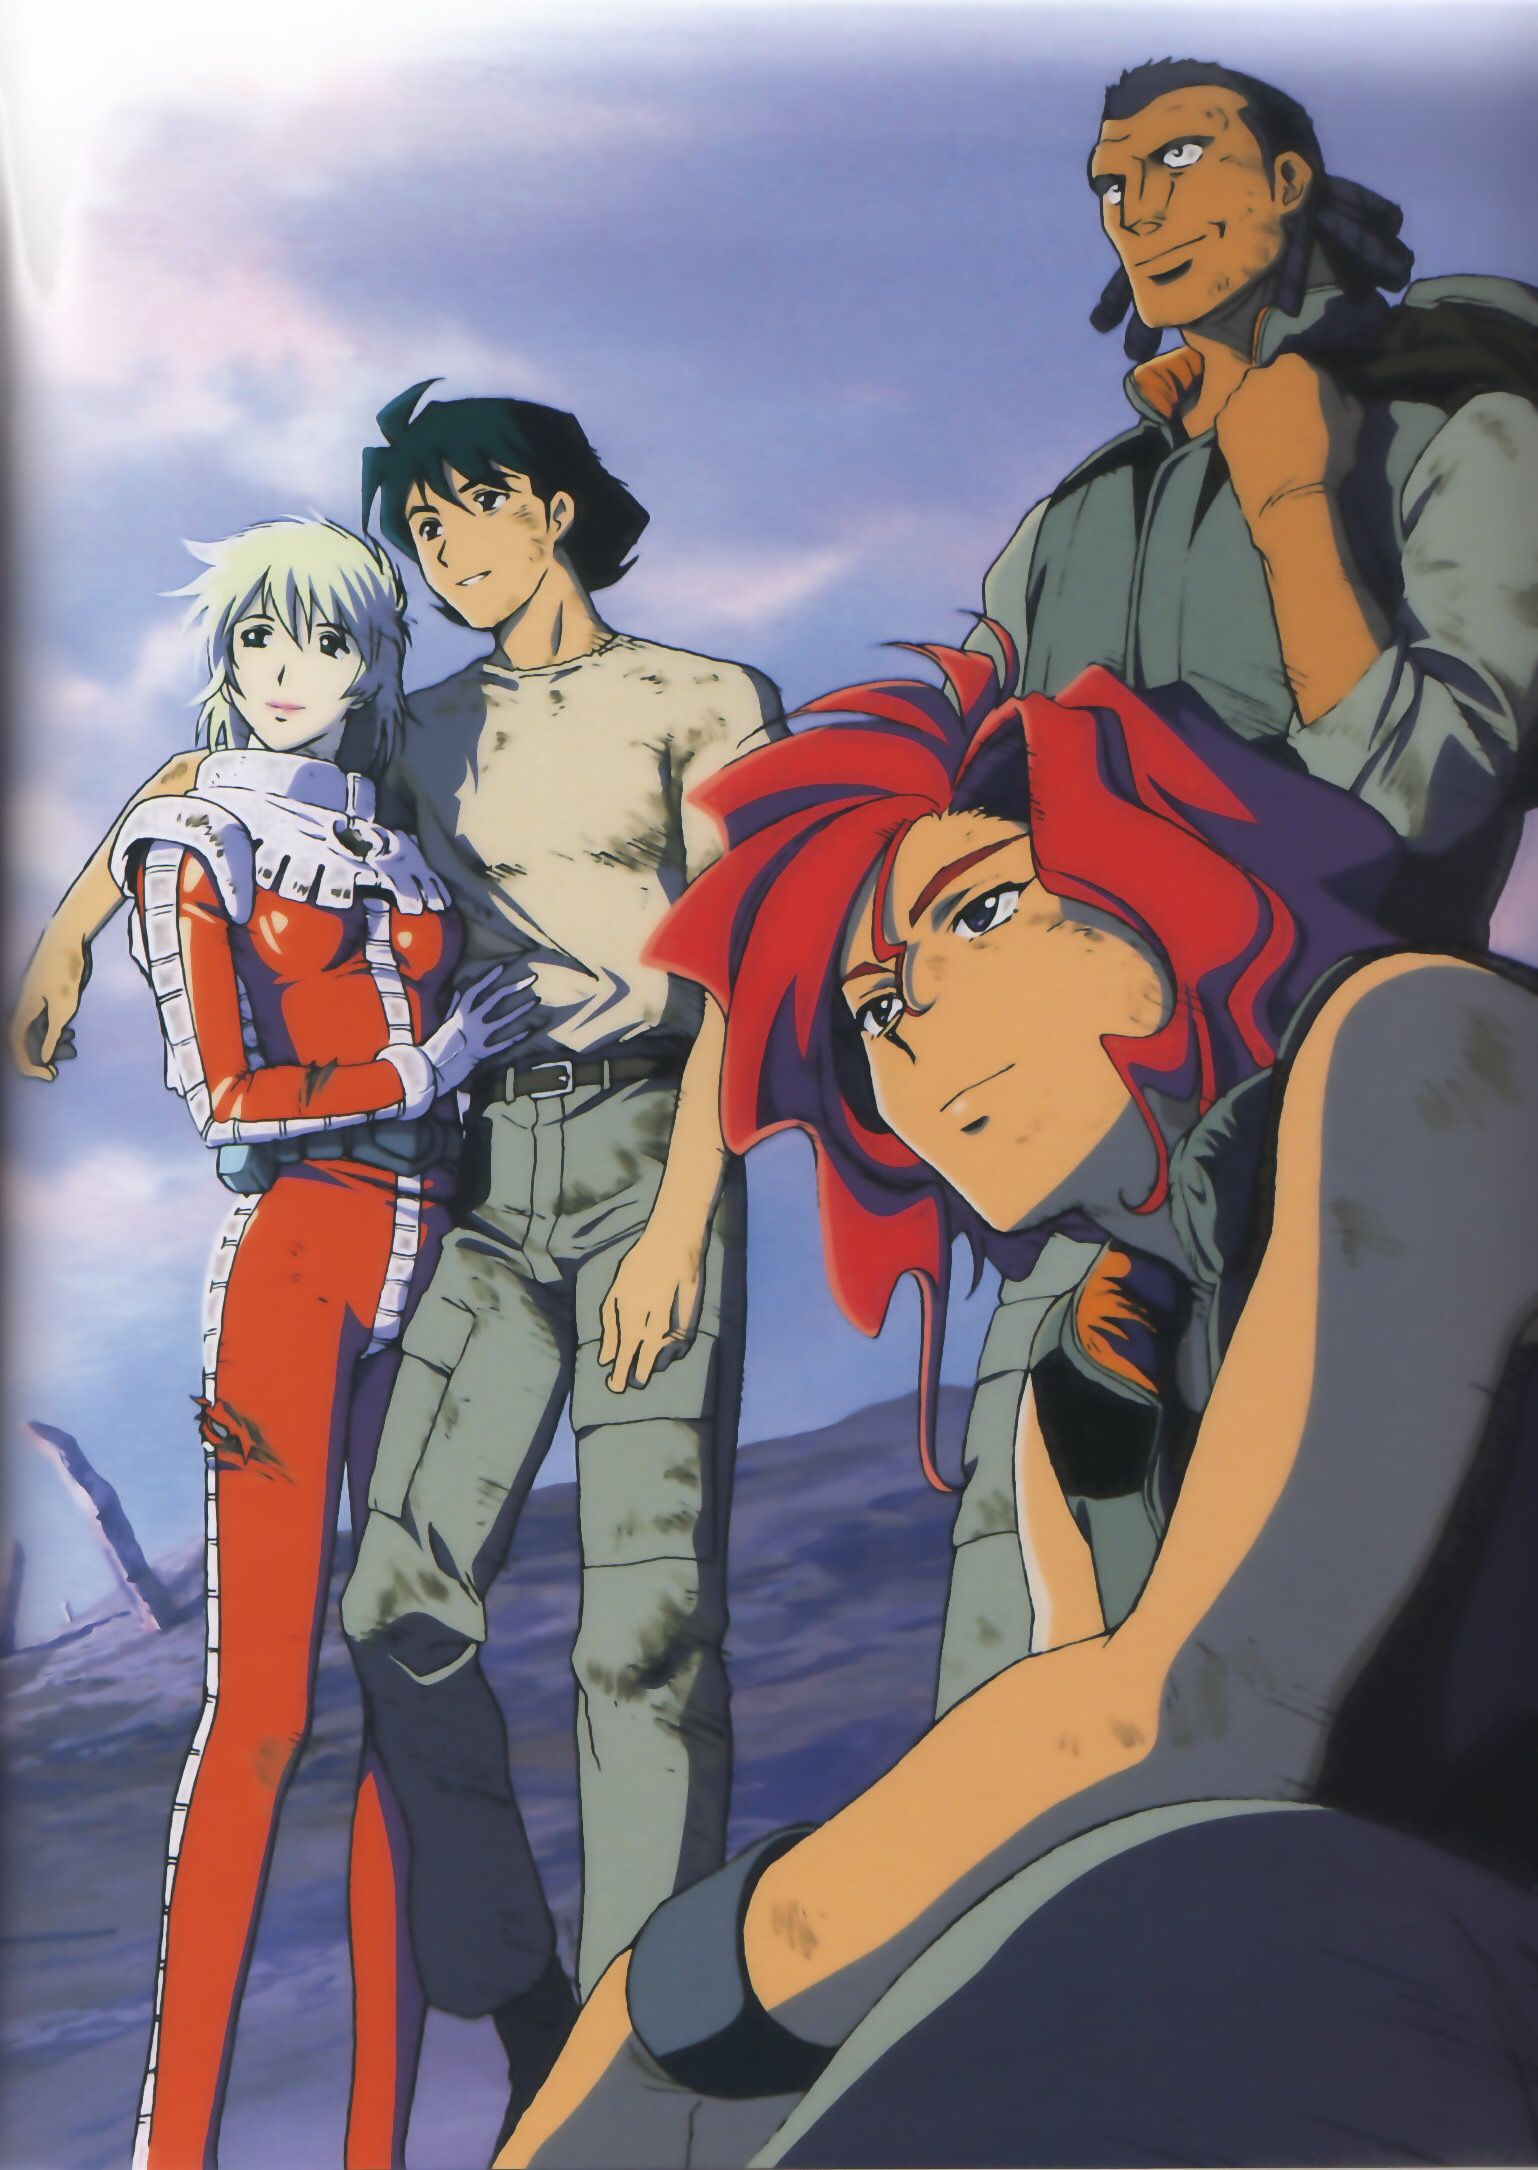 Mobile Suit Gundam The 08th Ms Team Anime Buff Anime Mobile Suit Gundam Wing